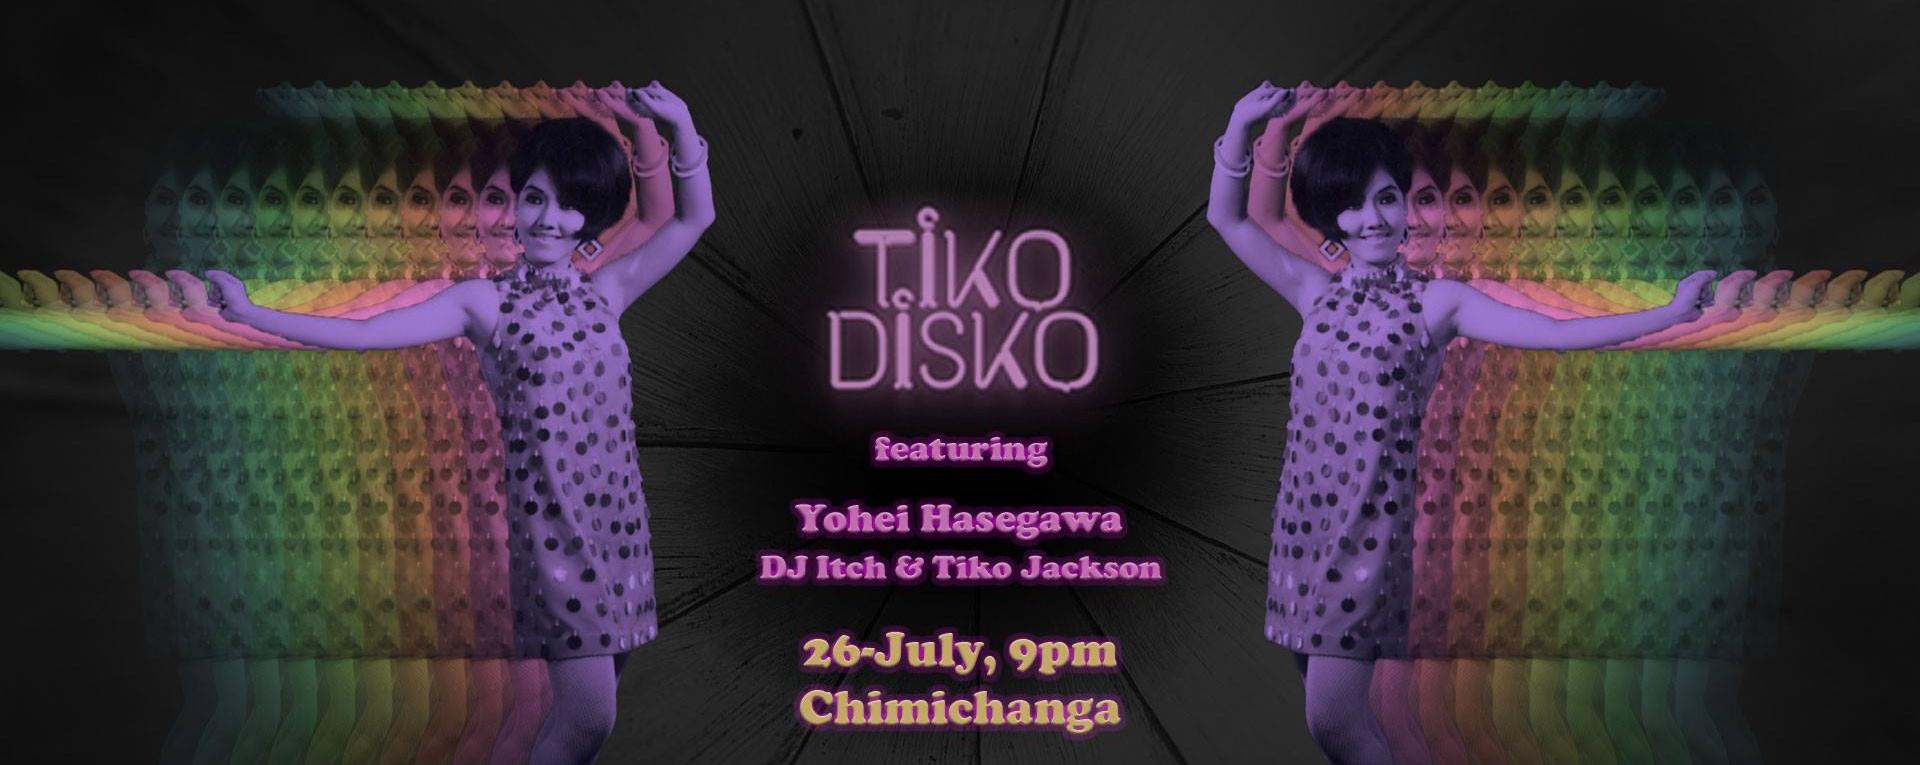 Tiko Disko